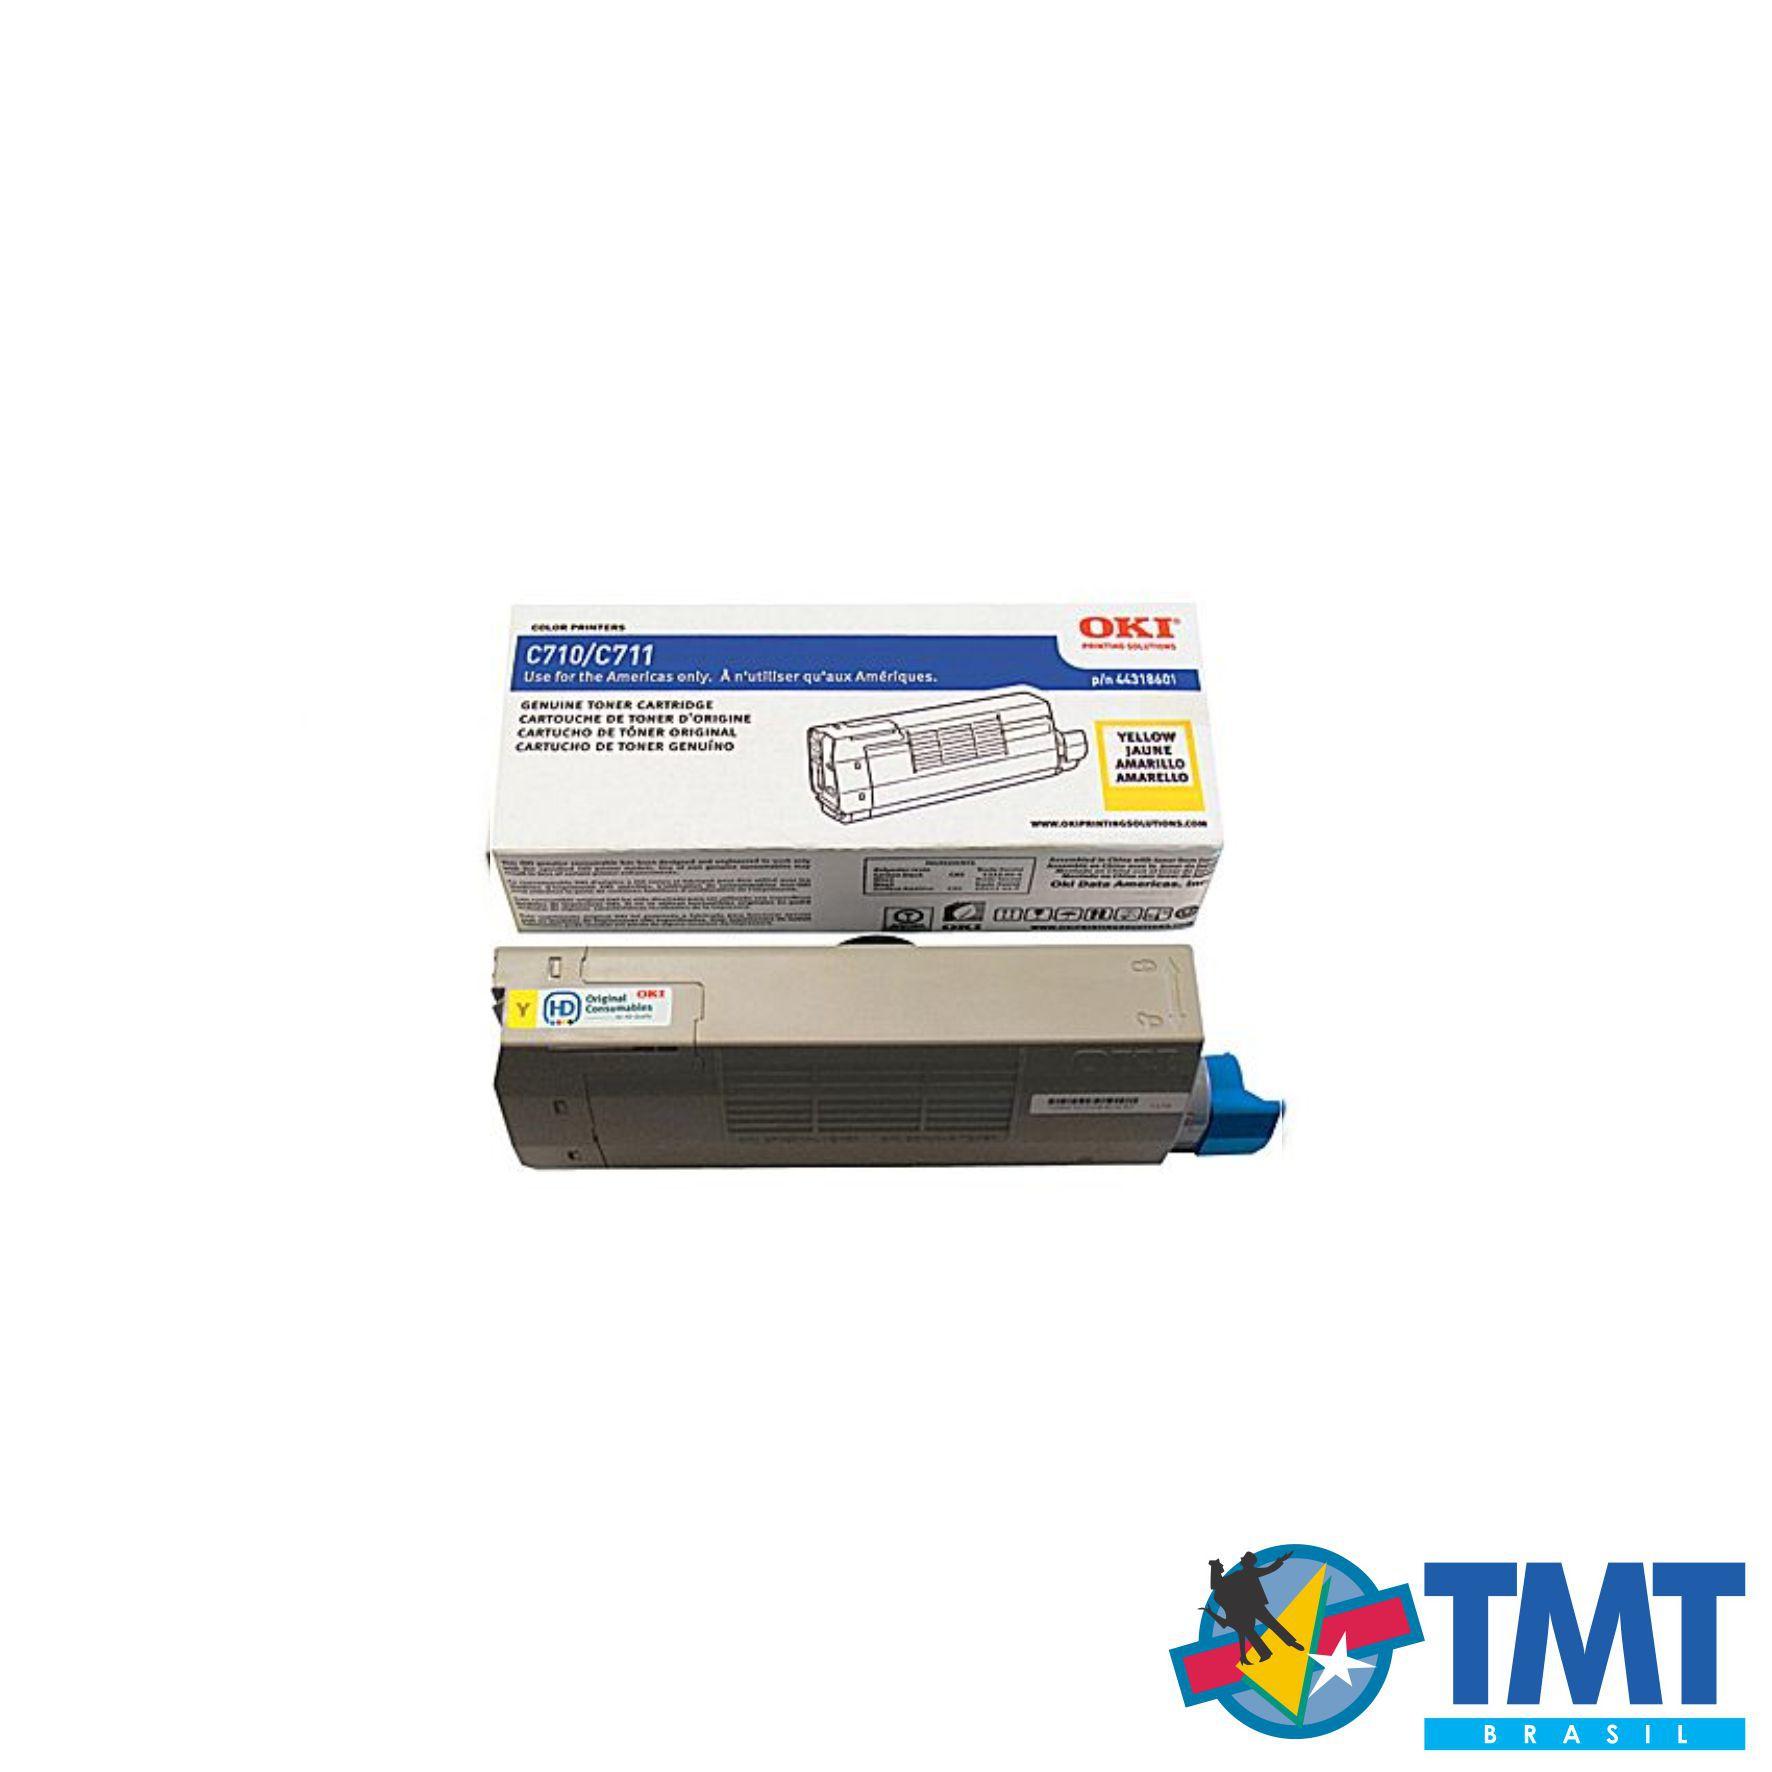 Cartucho de Toner Amarelo OKI C711 - Alta Capacidade